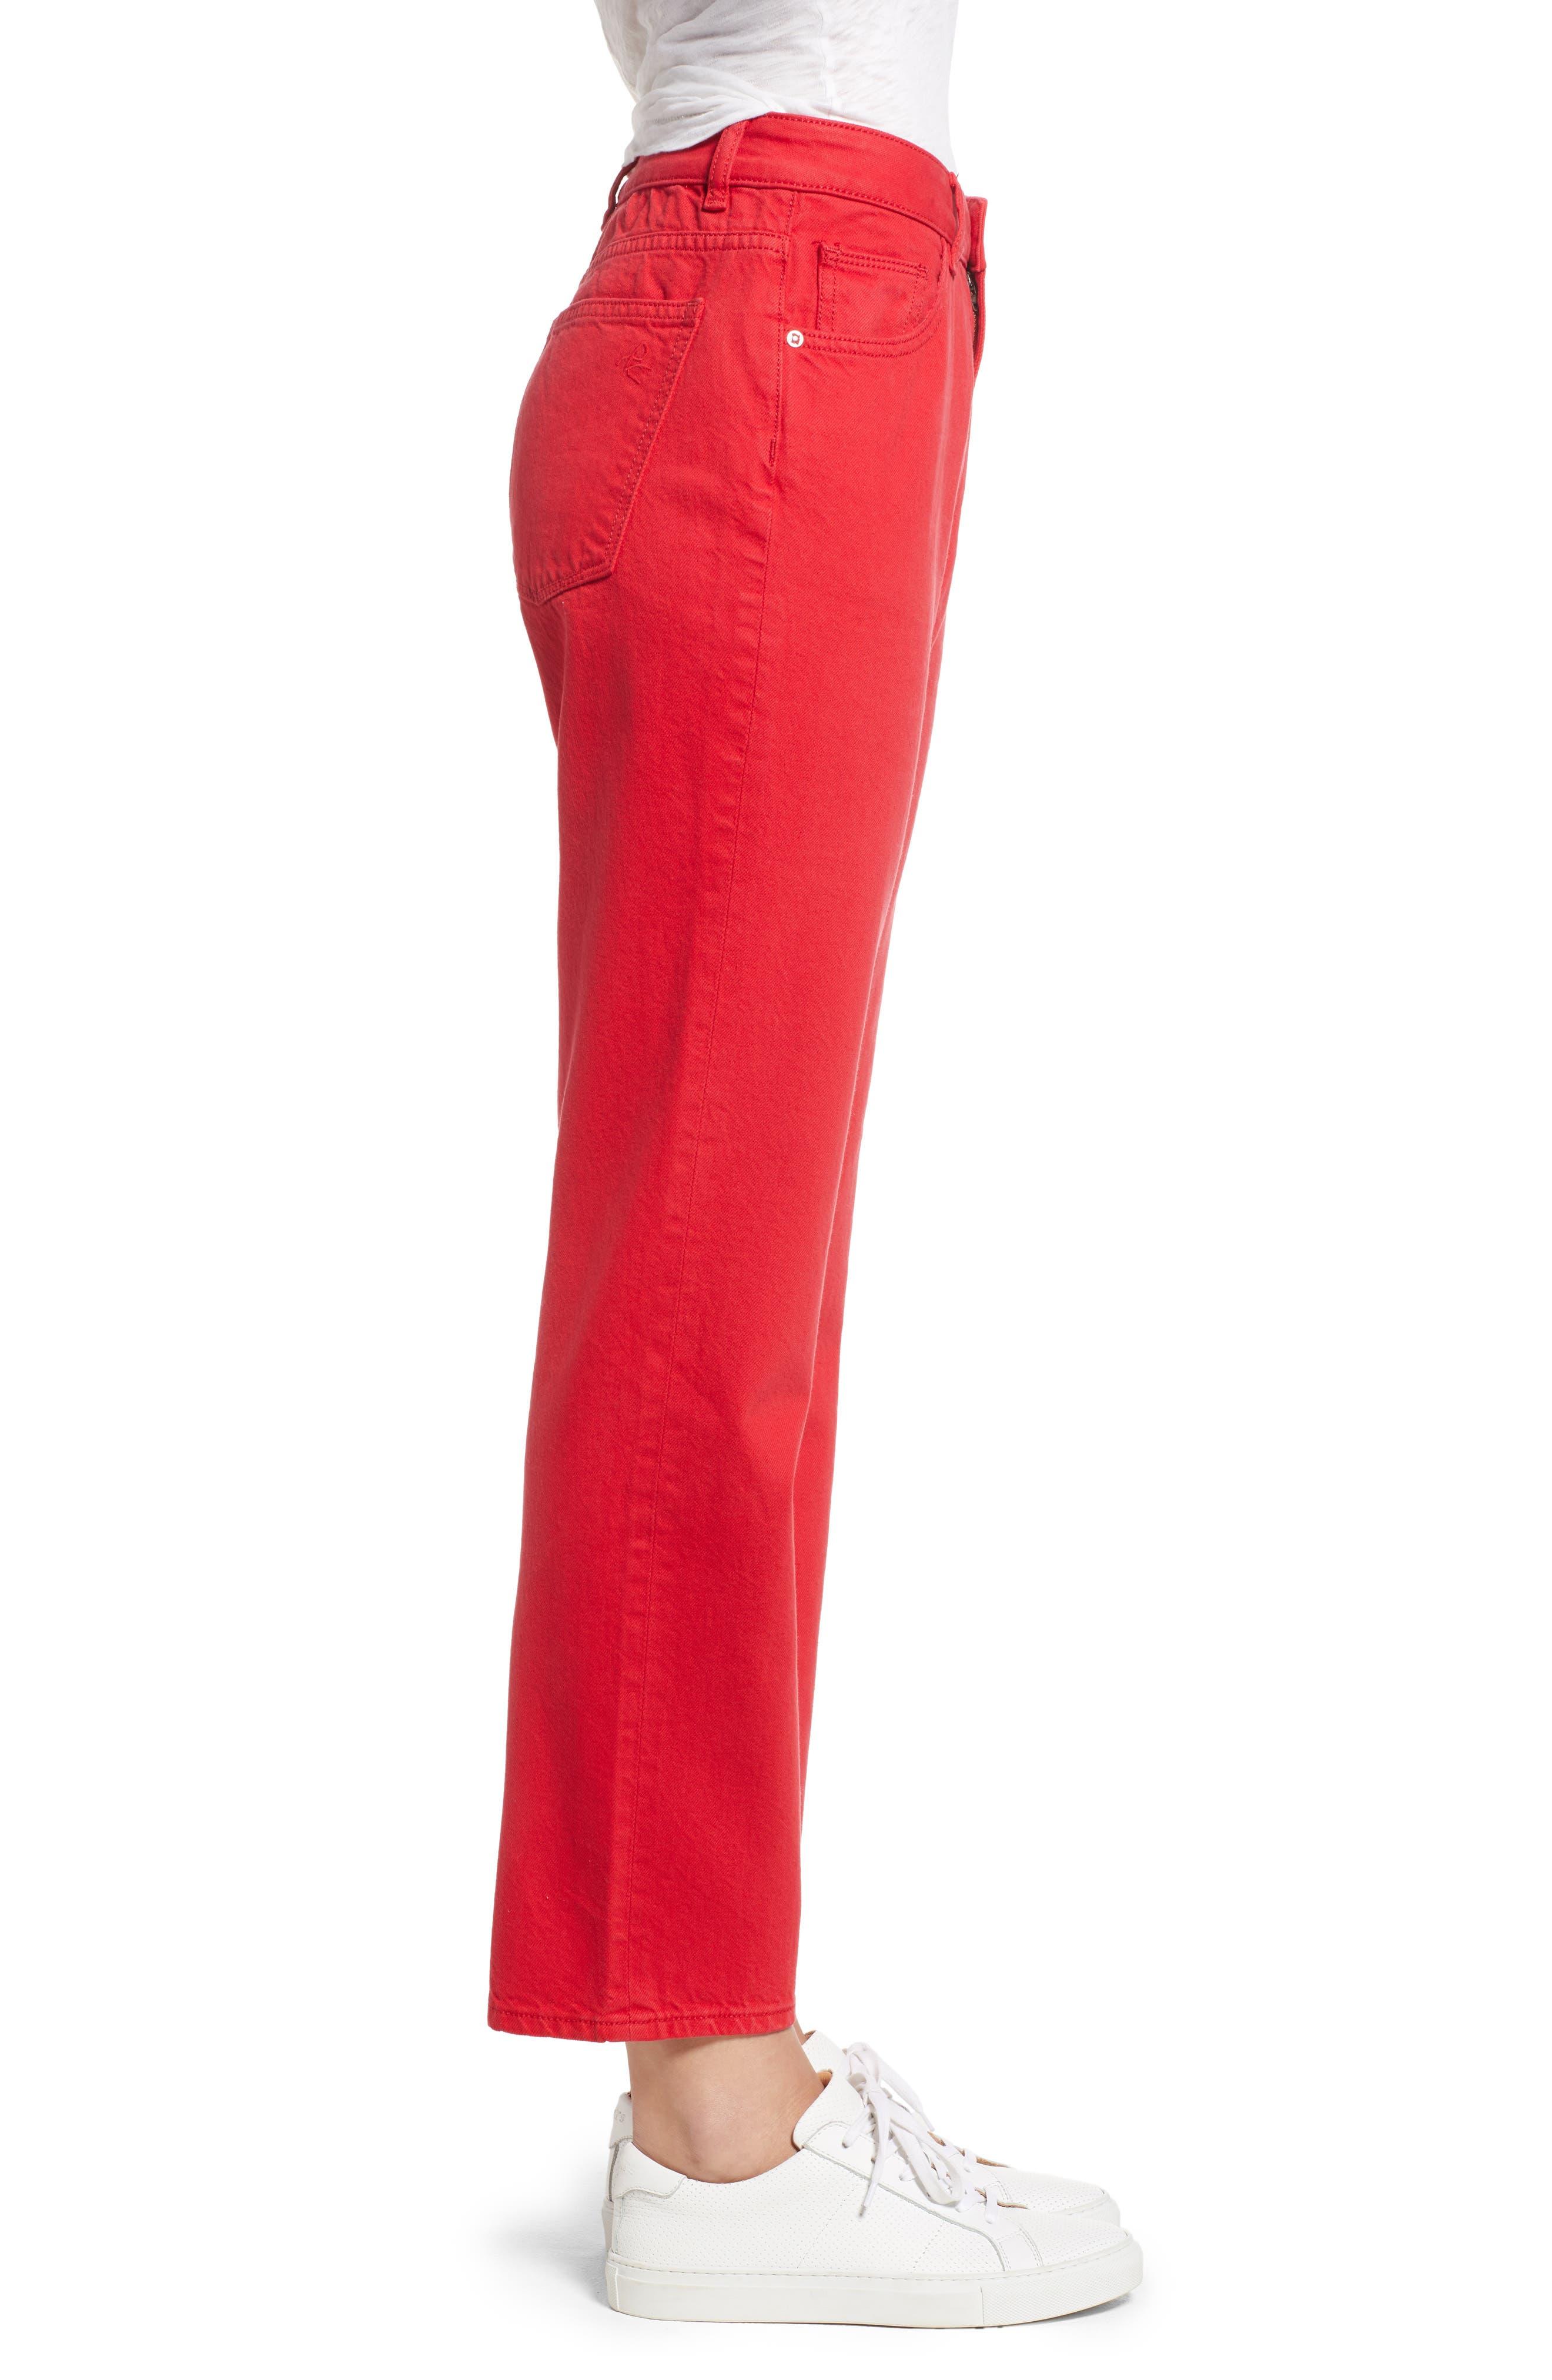 Jerry High Waist Straight Leg Jeans,                             Alternate thumbnail 3, color,                             600